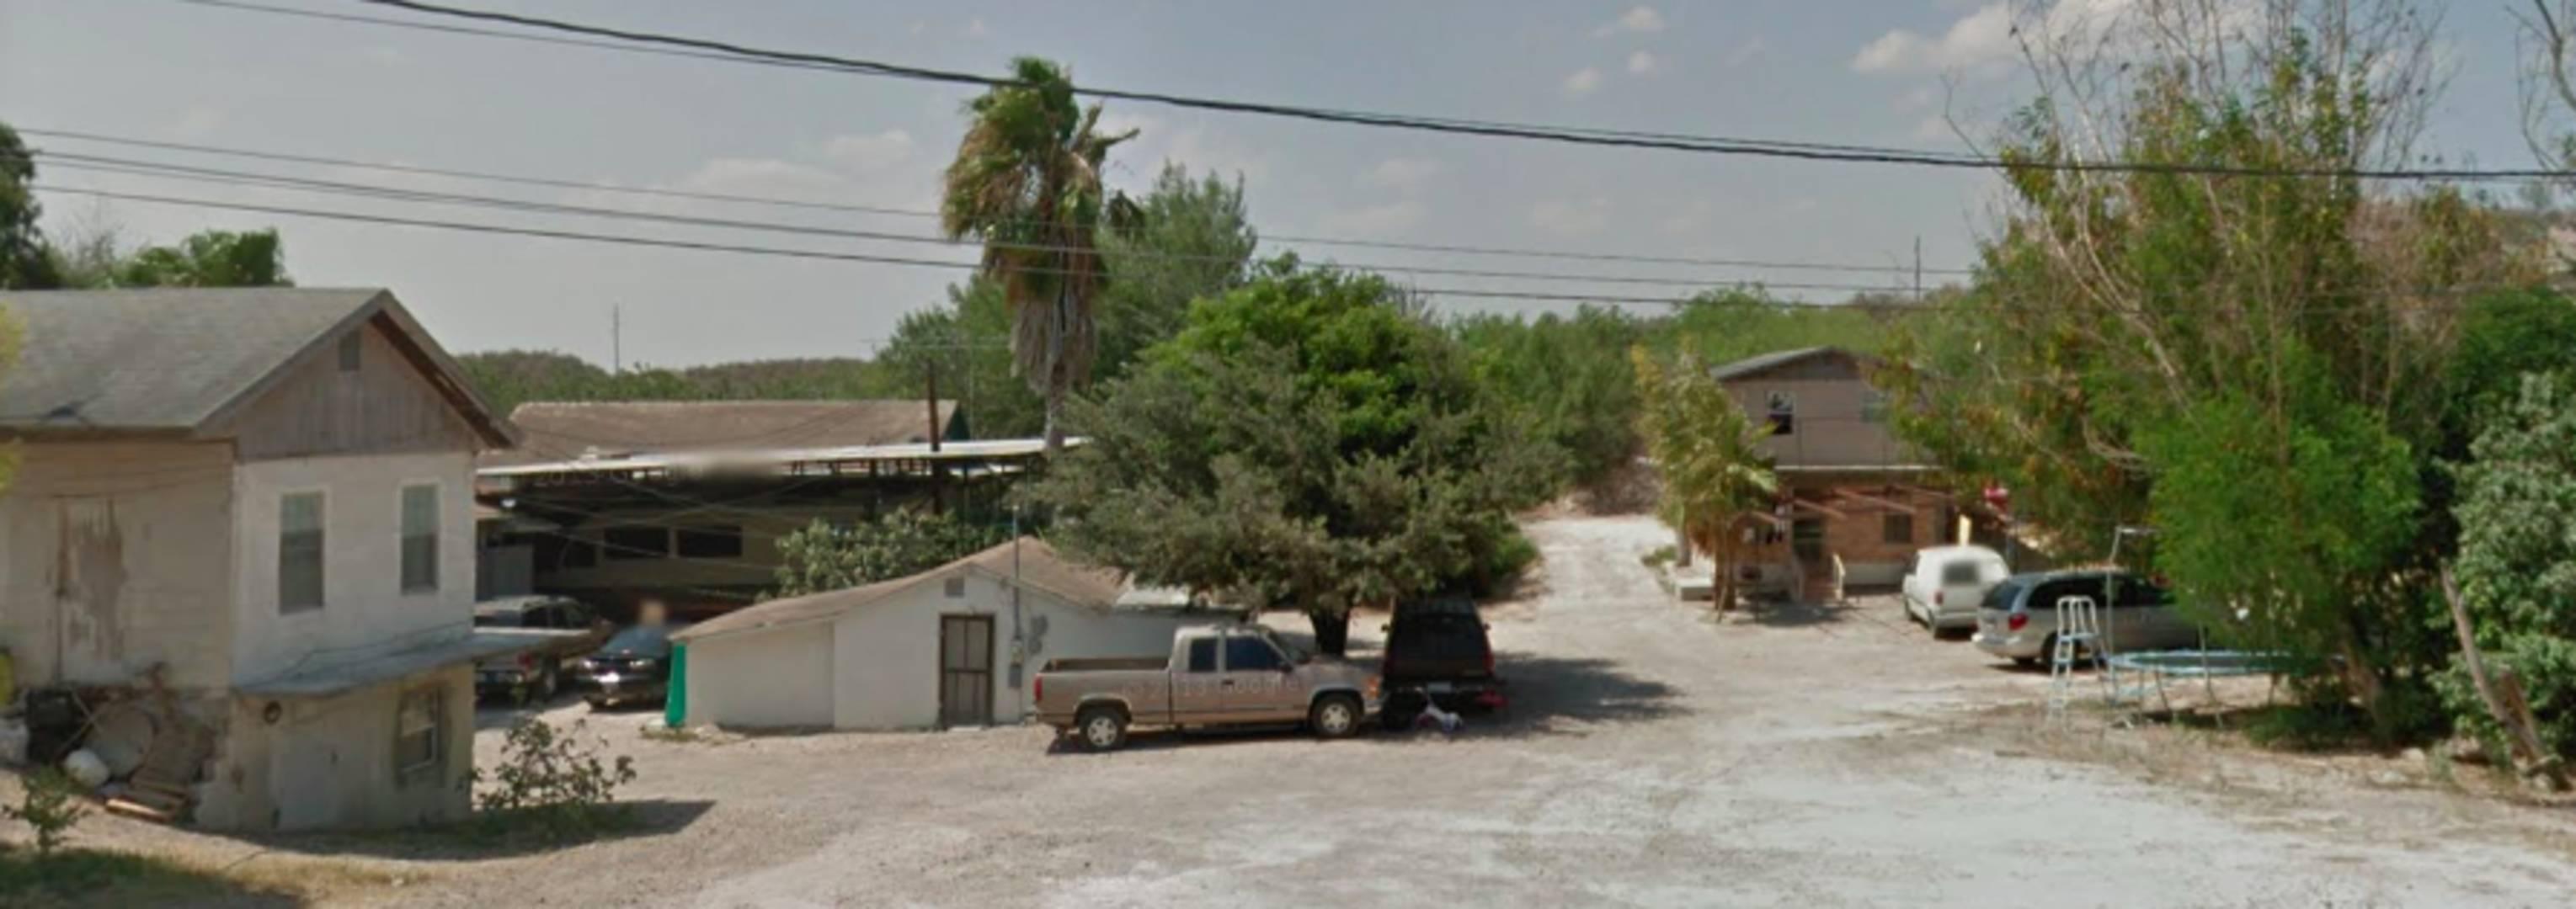 5895 E Highway 83 Rio Grande City, TX 78582